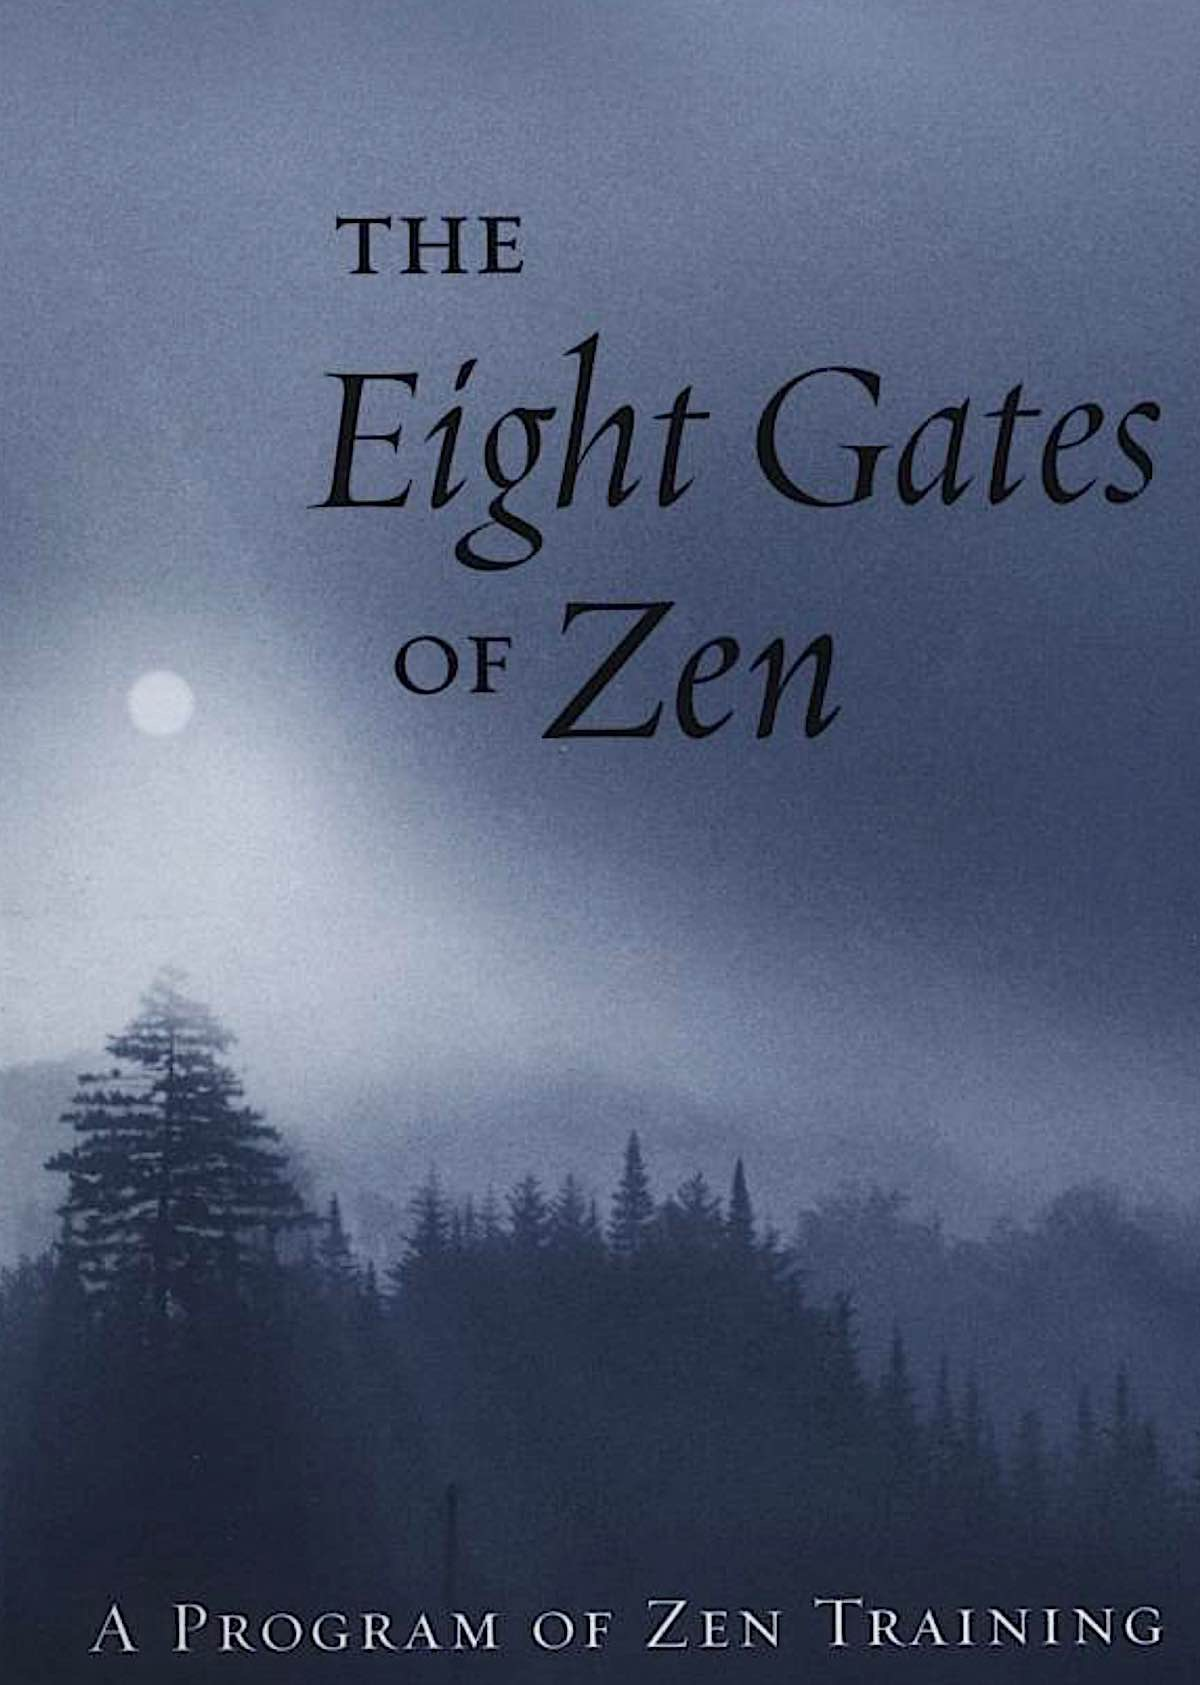 Buddha Weekly The Eight Gates of Zen by John Daido Loori Buddhism